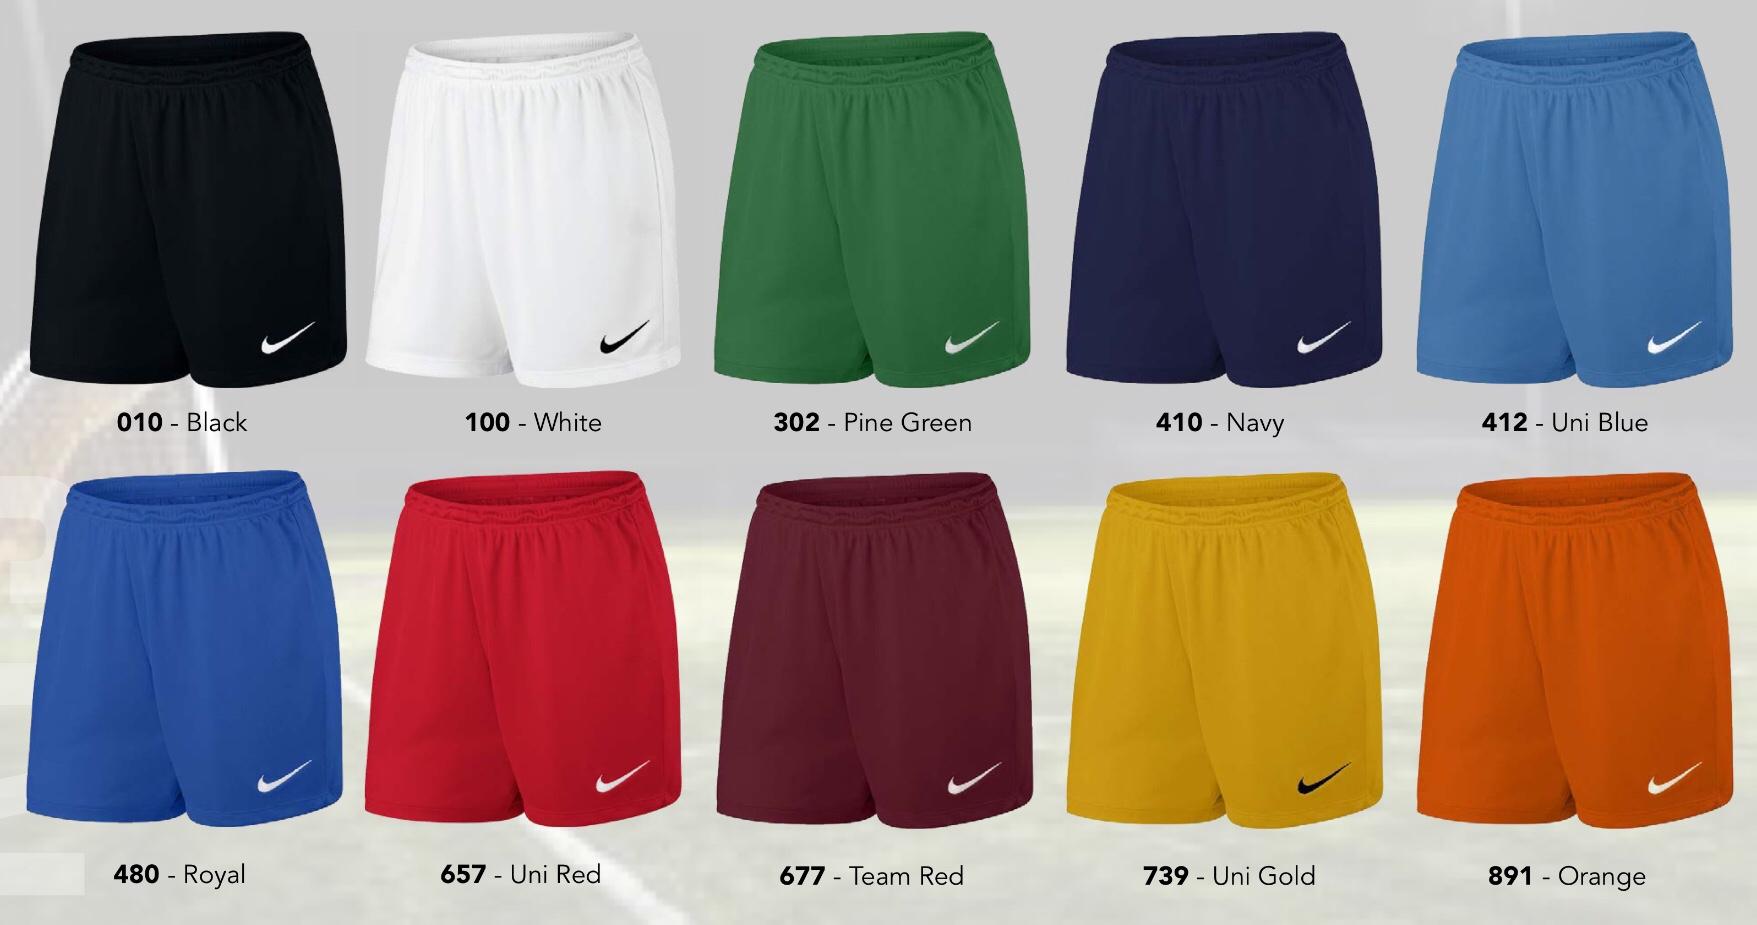 f207472778f3 Nike Women s Park II Knit Shorts (Royal Blue) - The Football Factory